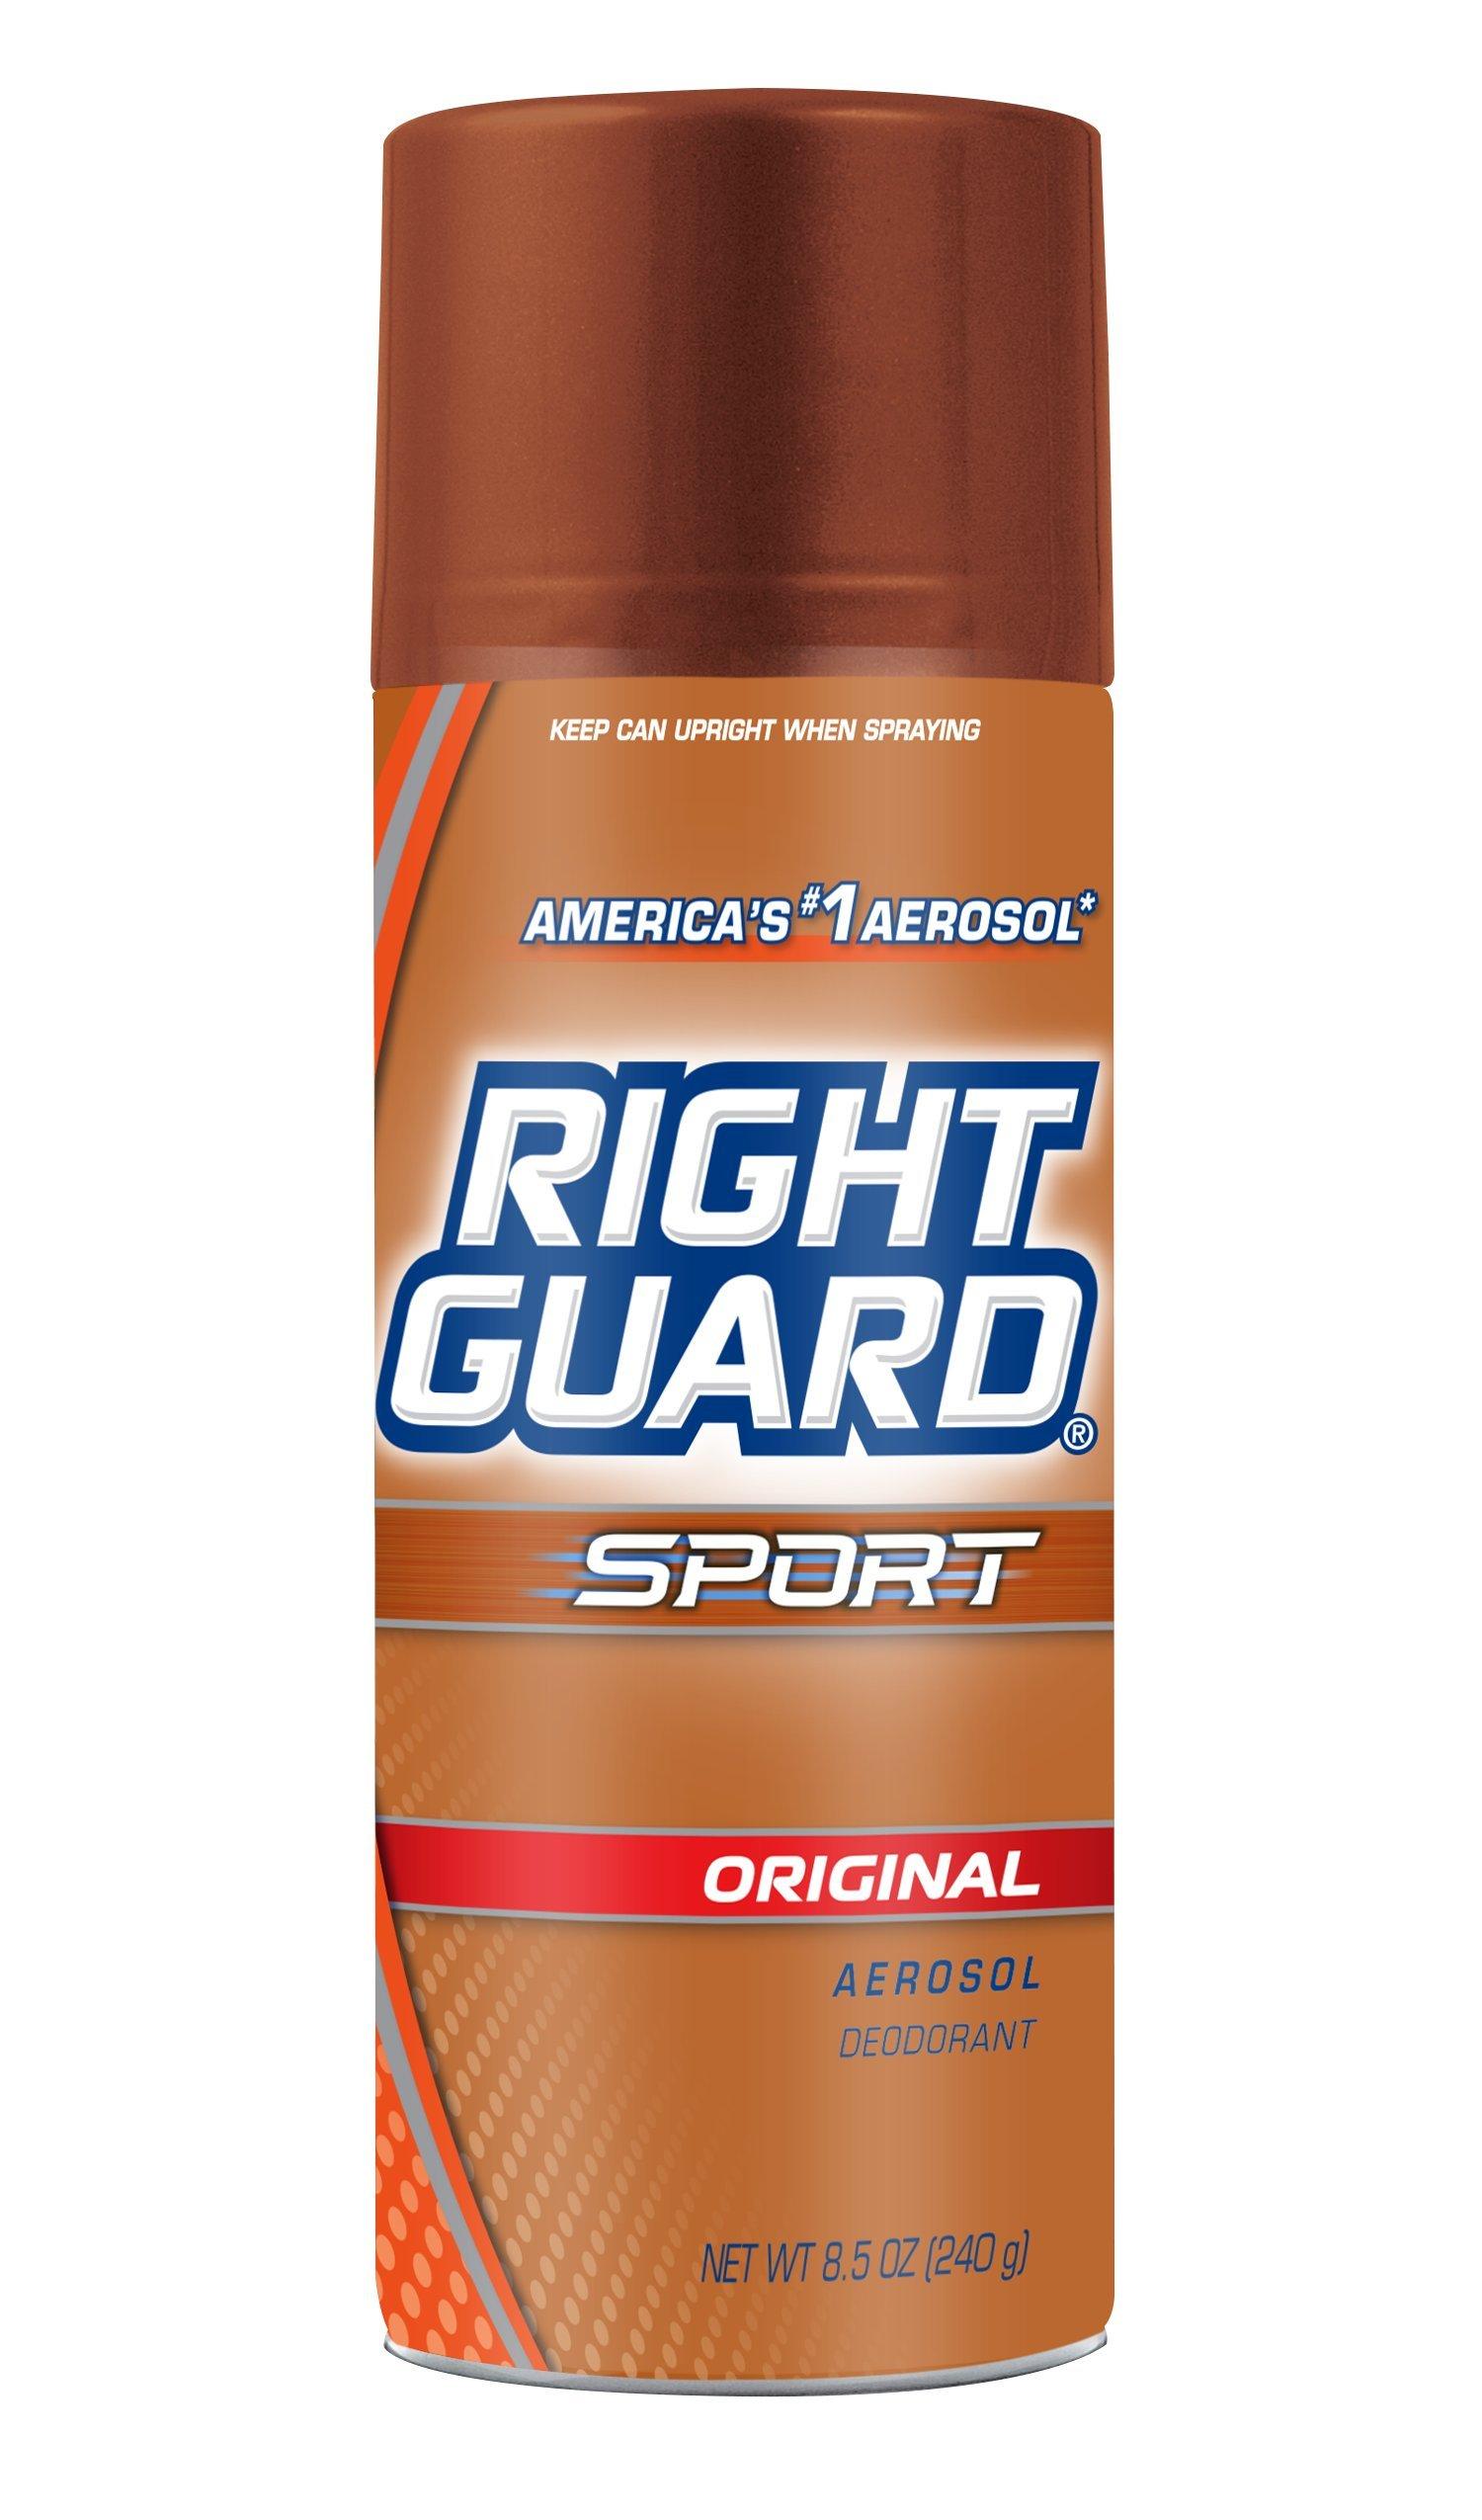 Right Guard 1432625 8.5 Oz. Sport Aerosol DEO Orig (Pack of 12)